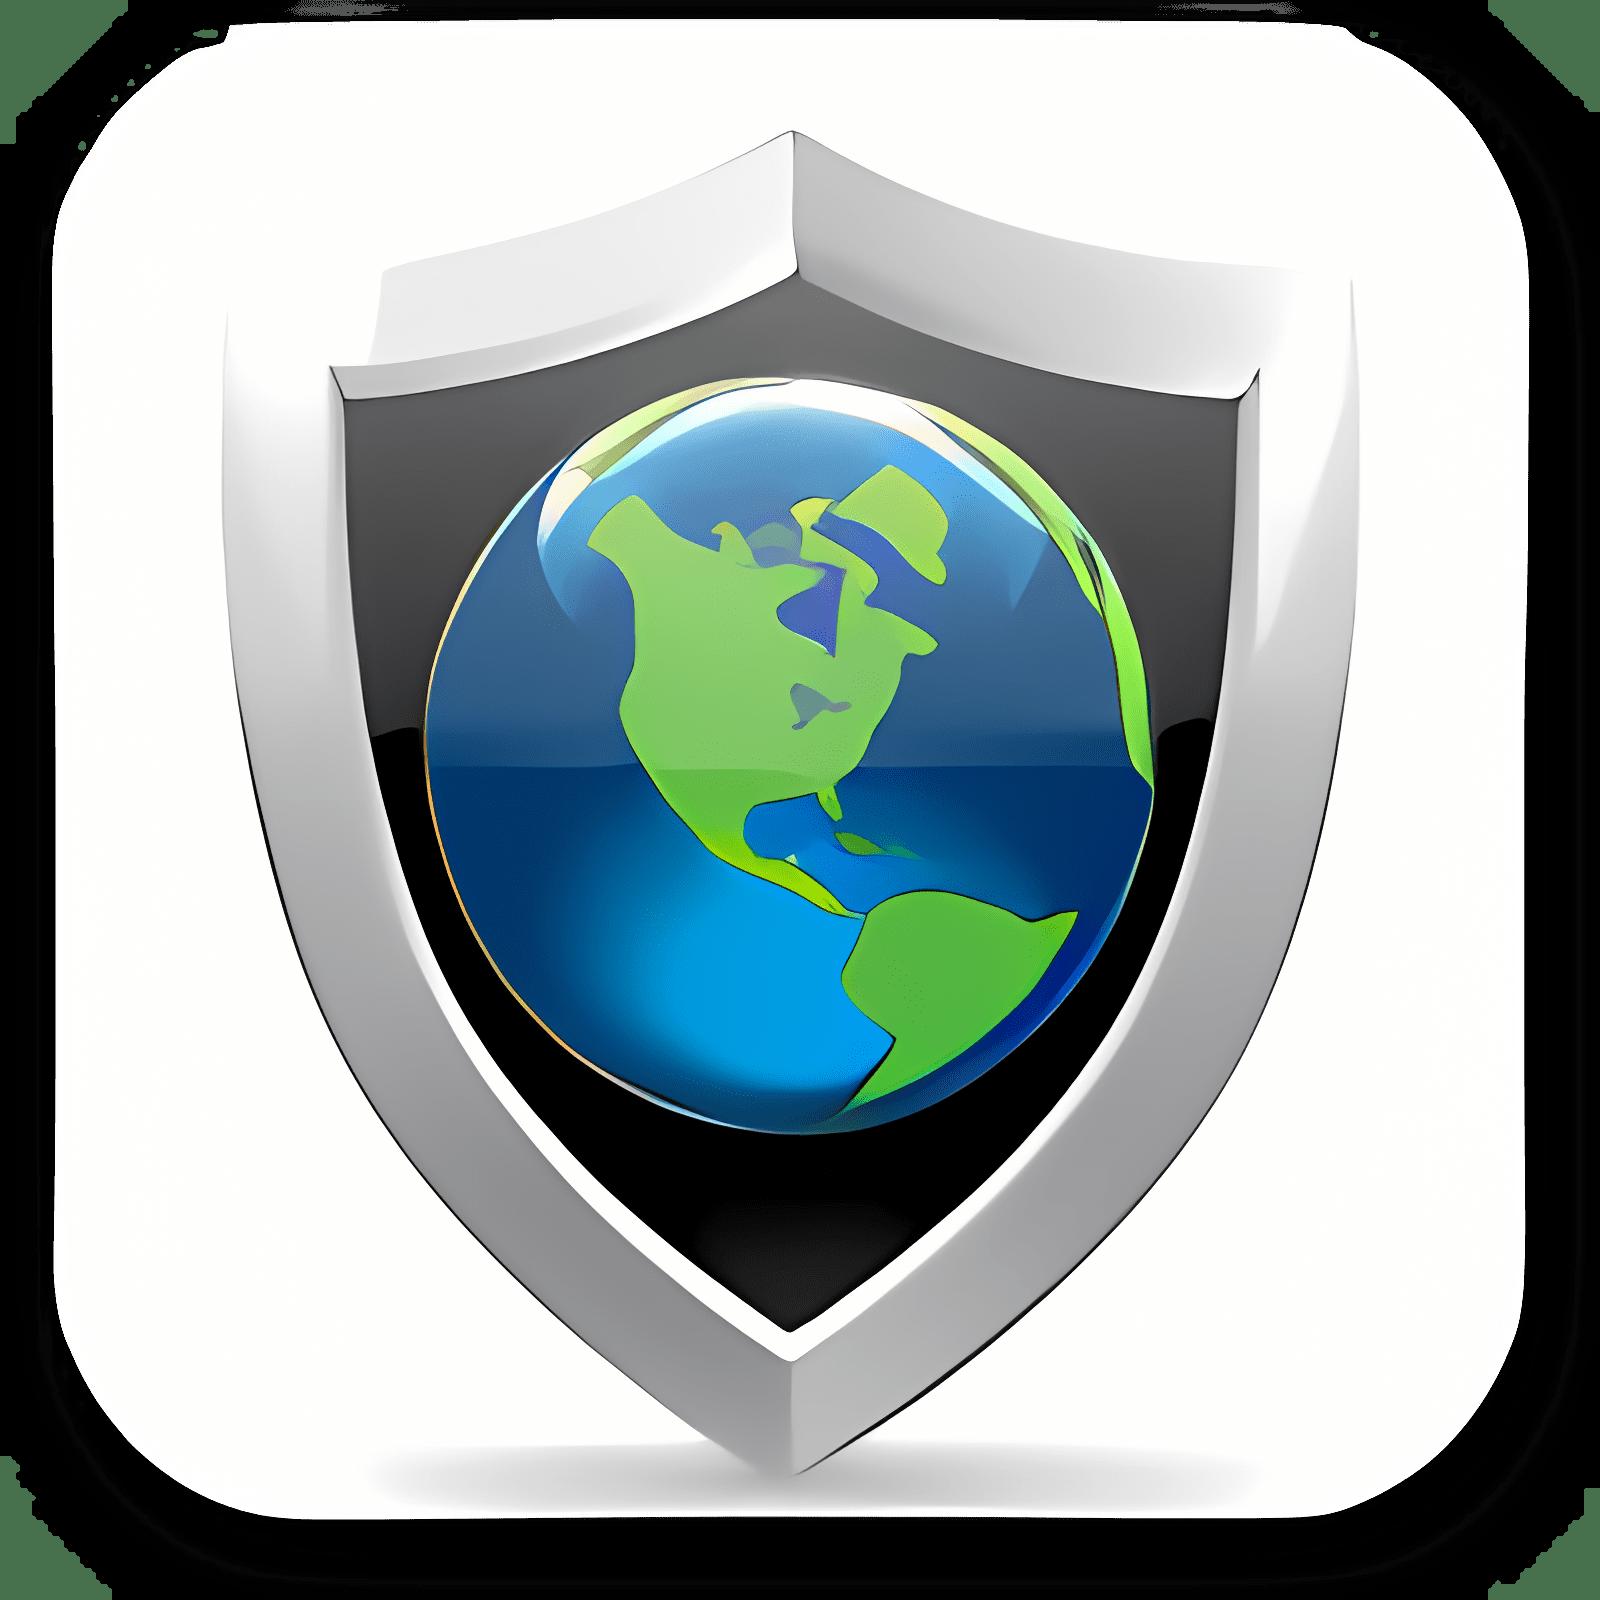 Expat Shield